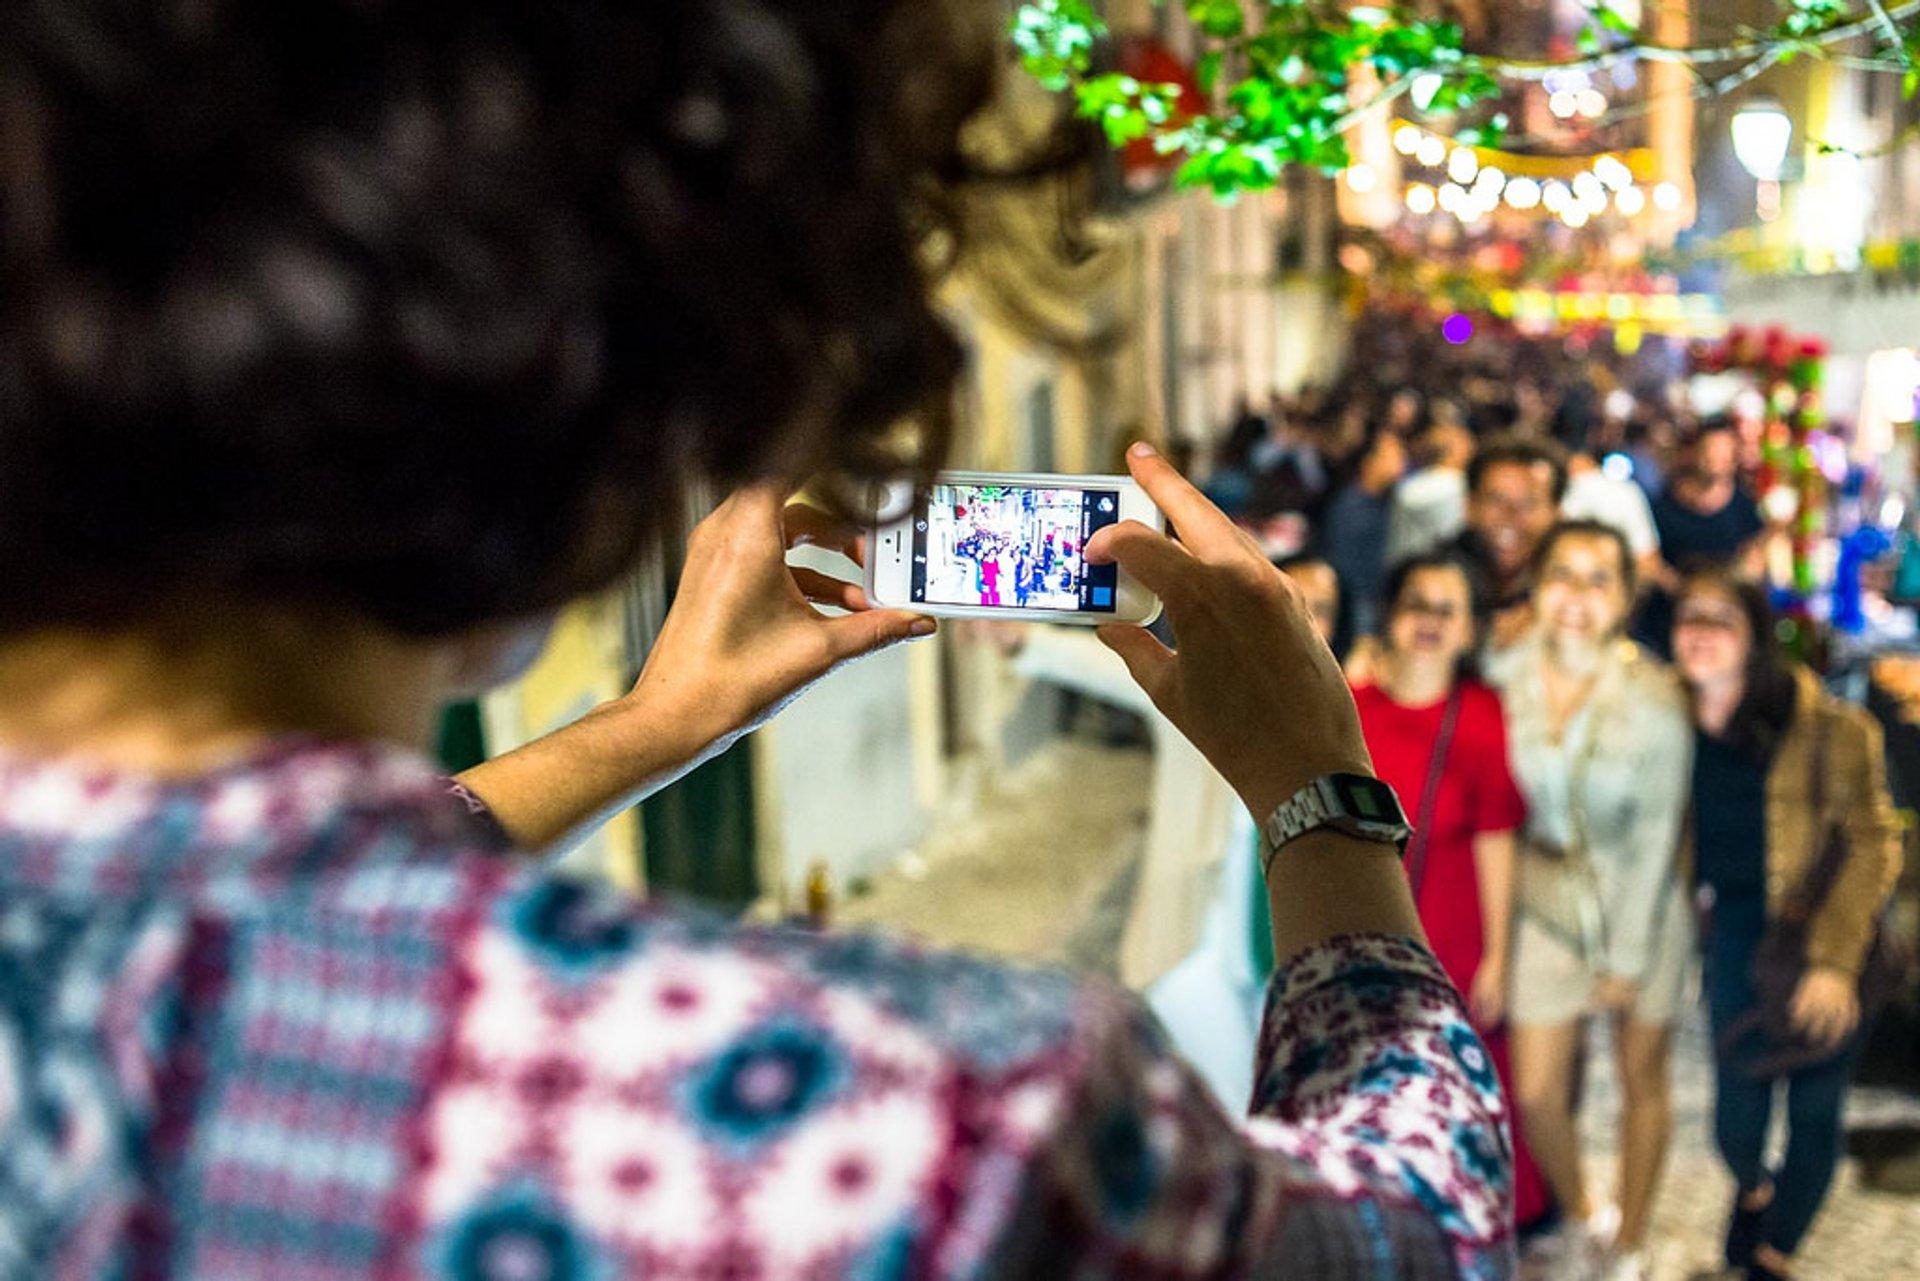 Festas de Lisboa (Festas dos Santos Populares) in Lisbon 2020 - Best Time